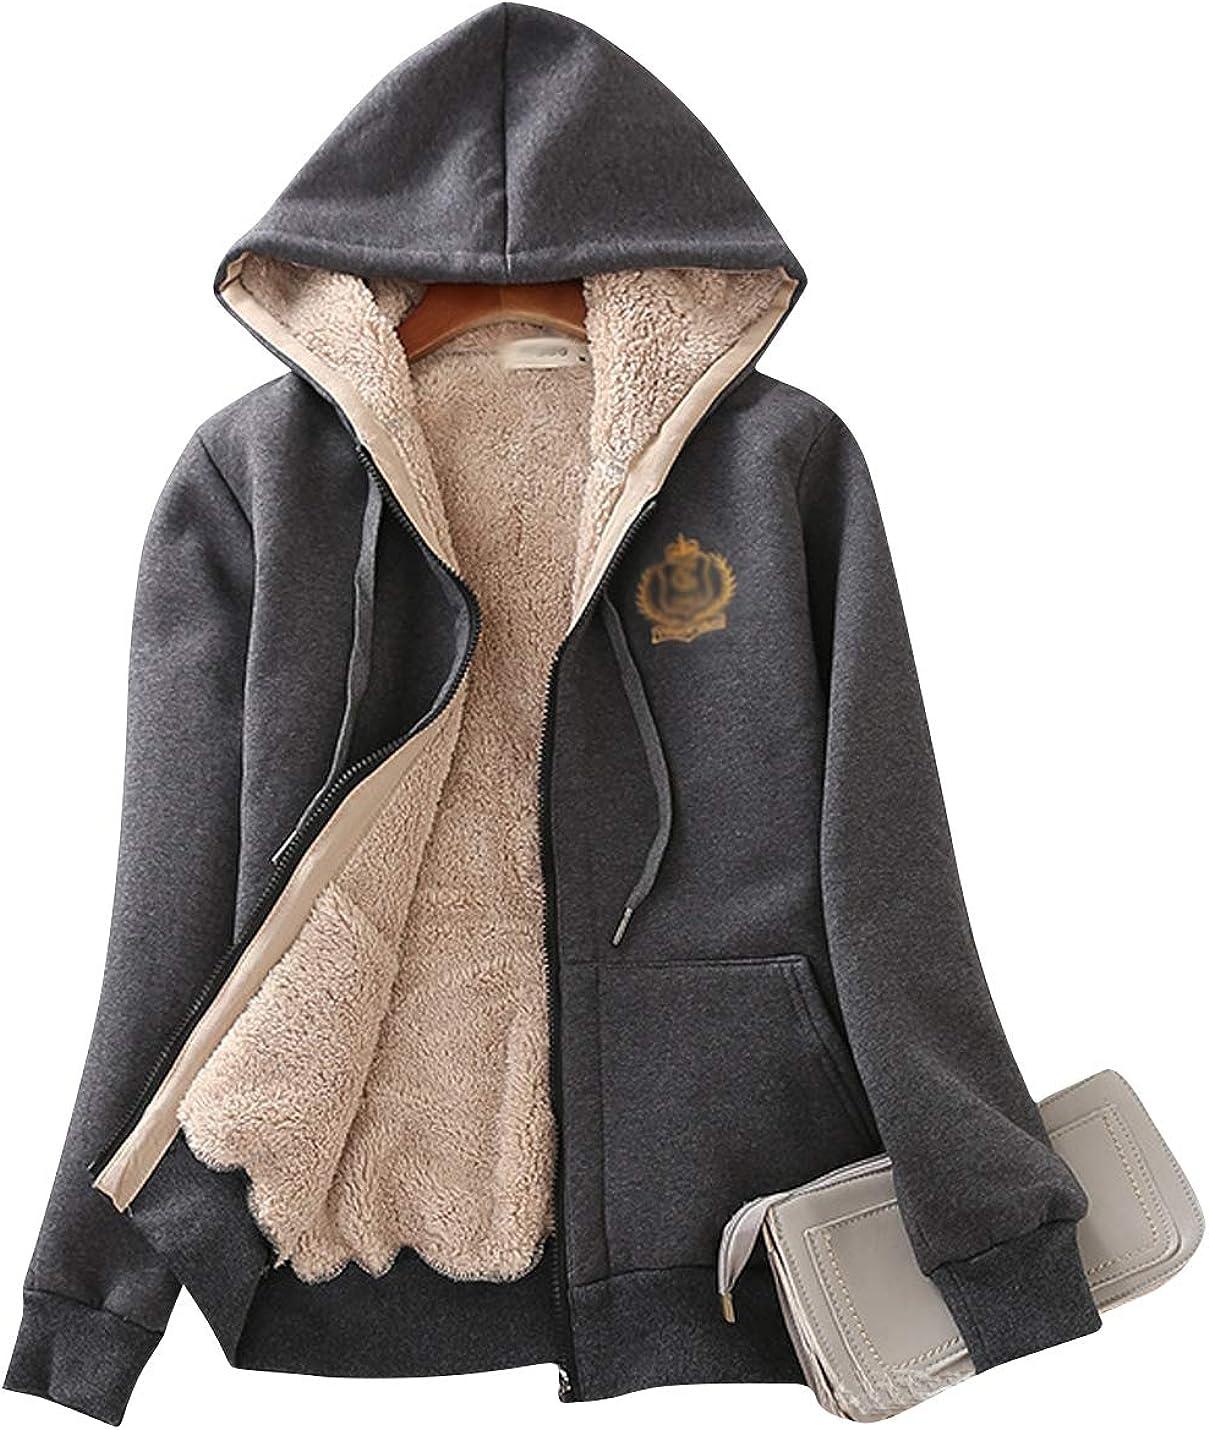 Wholesale ZGZZ7 Women's Winter Year-end gift Warm Comfort Sweatshirts Sherpa-Lined Activ